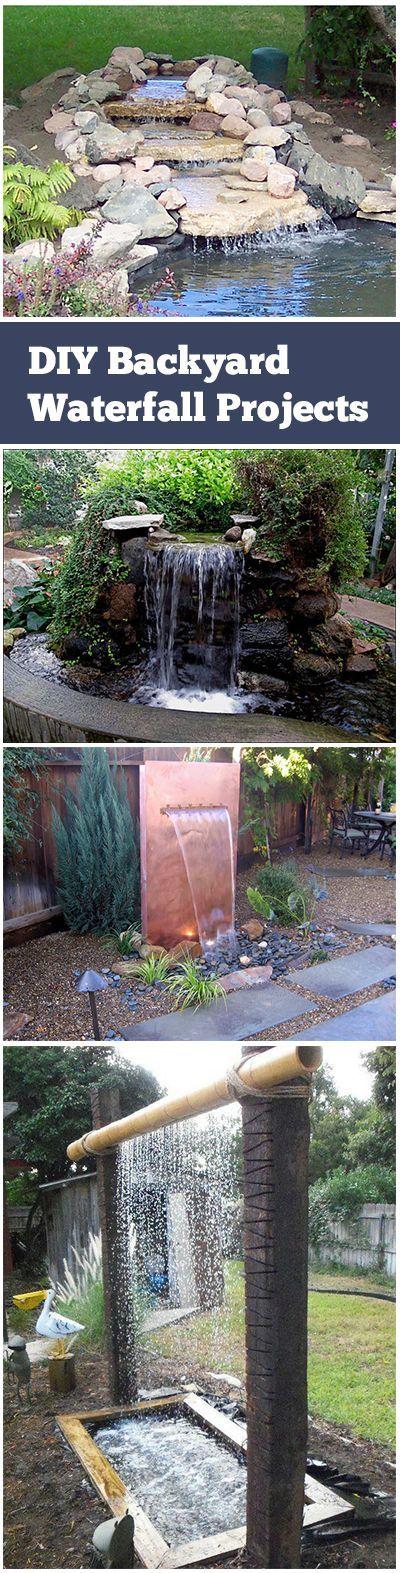 Diy Backyard Waterfall Projects Waterfalls Backyard Backyard Water Feature Diy Backyard